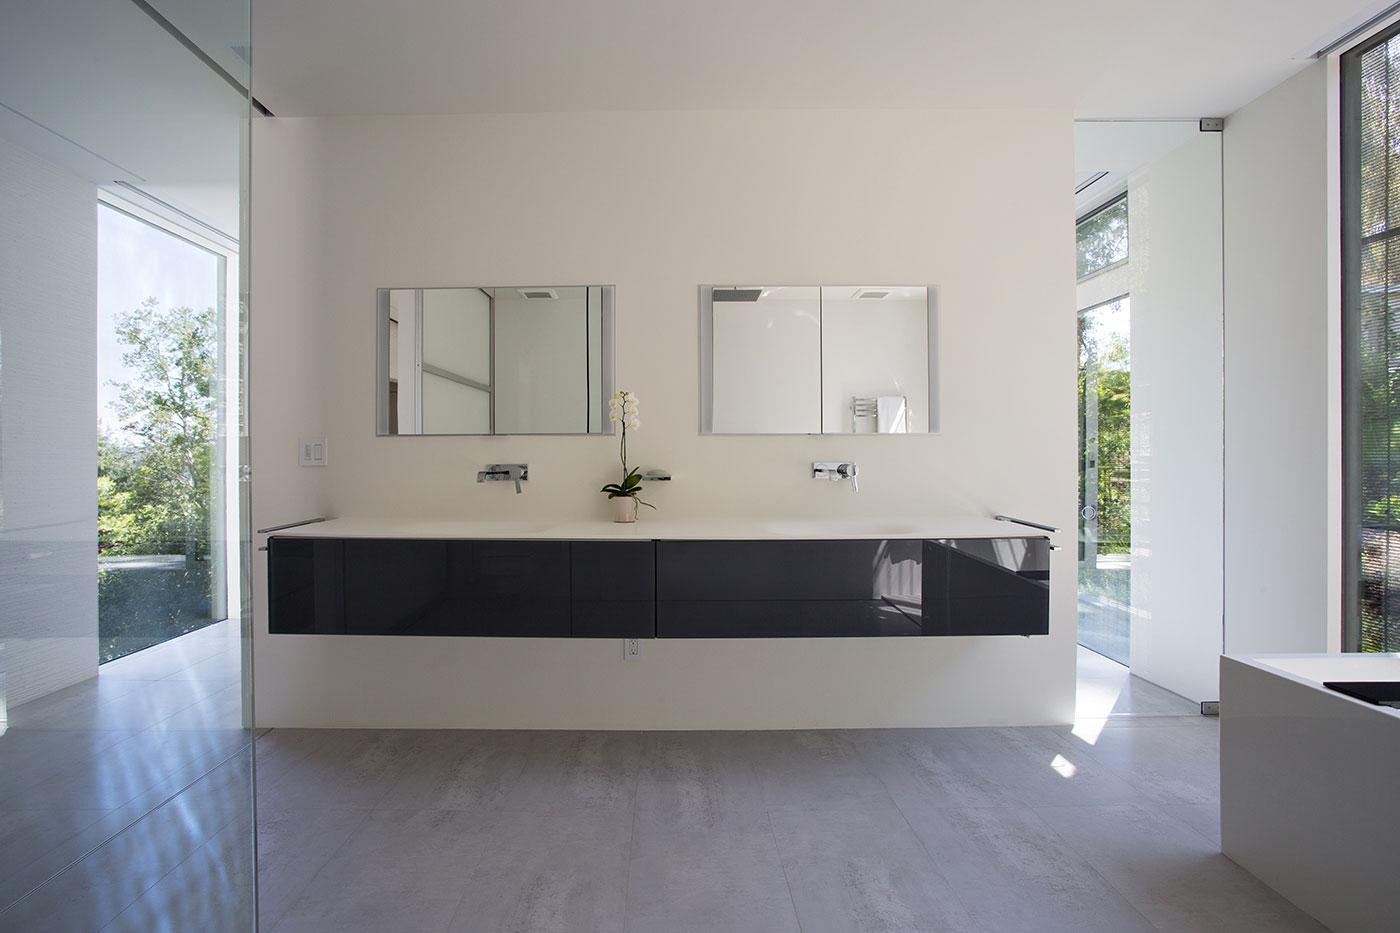 Minimal Modern Addition Home with Dark Grey Stuccoed Walls by Klopf Architecture-17